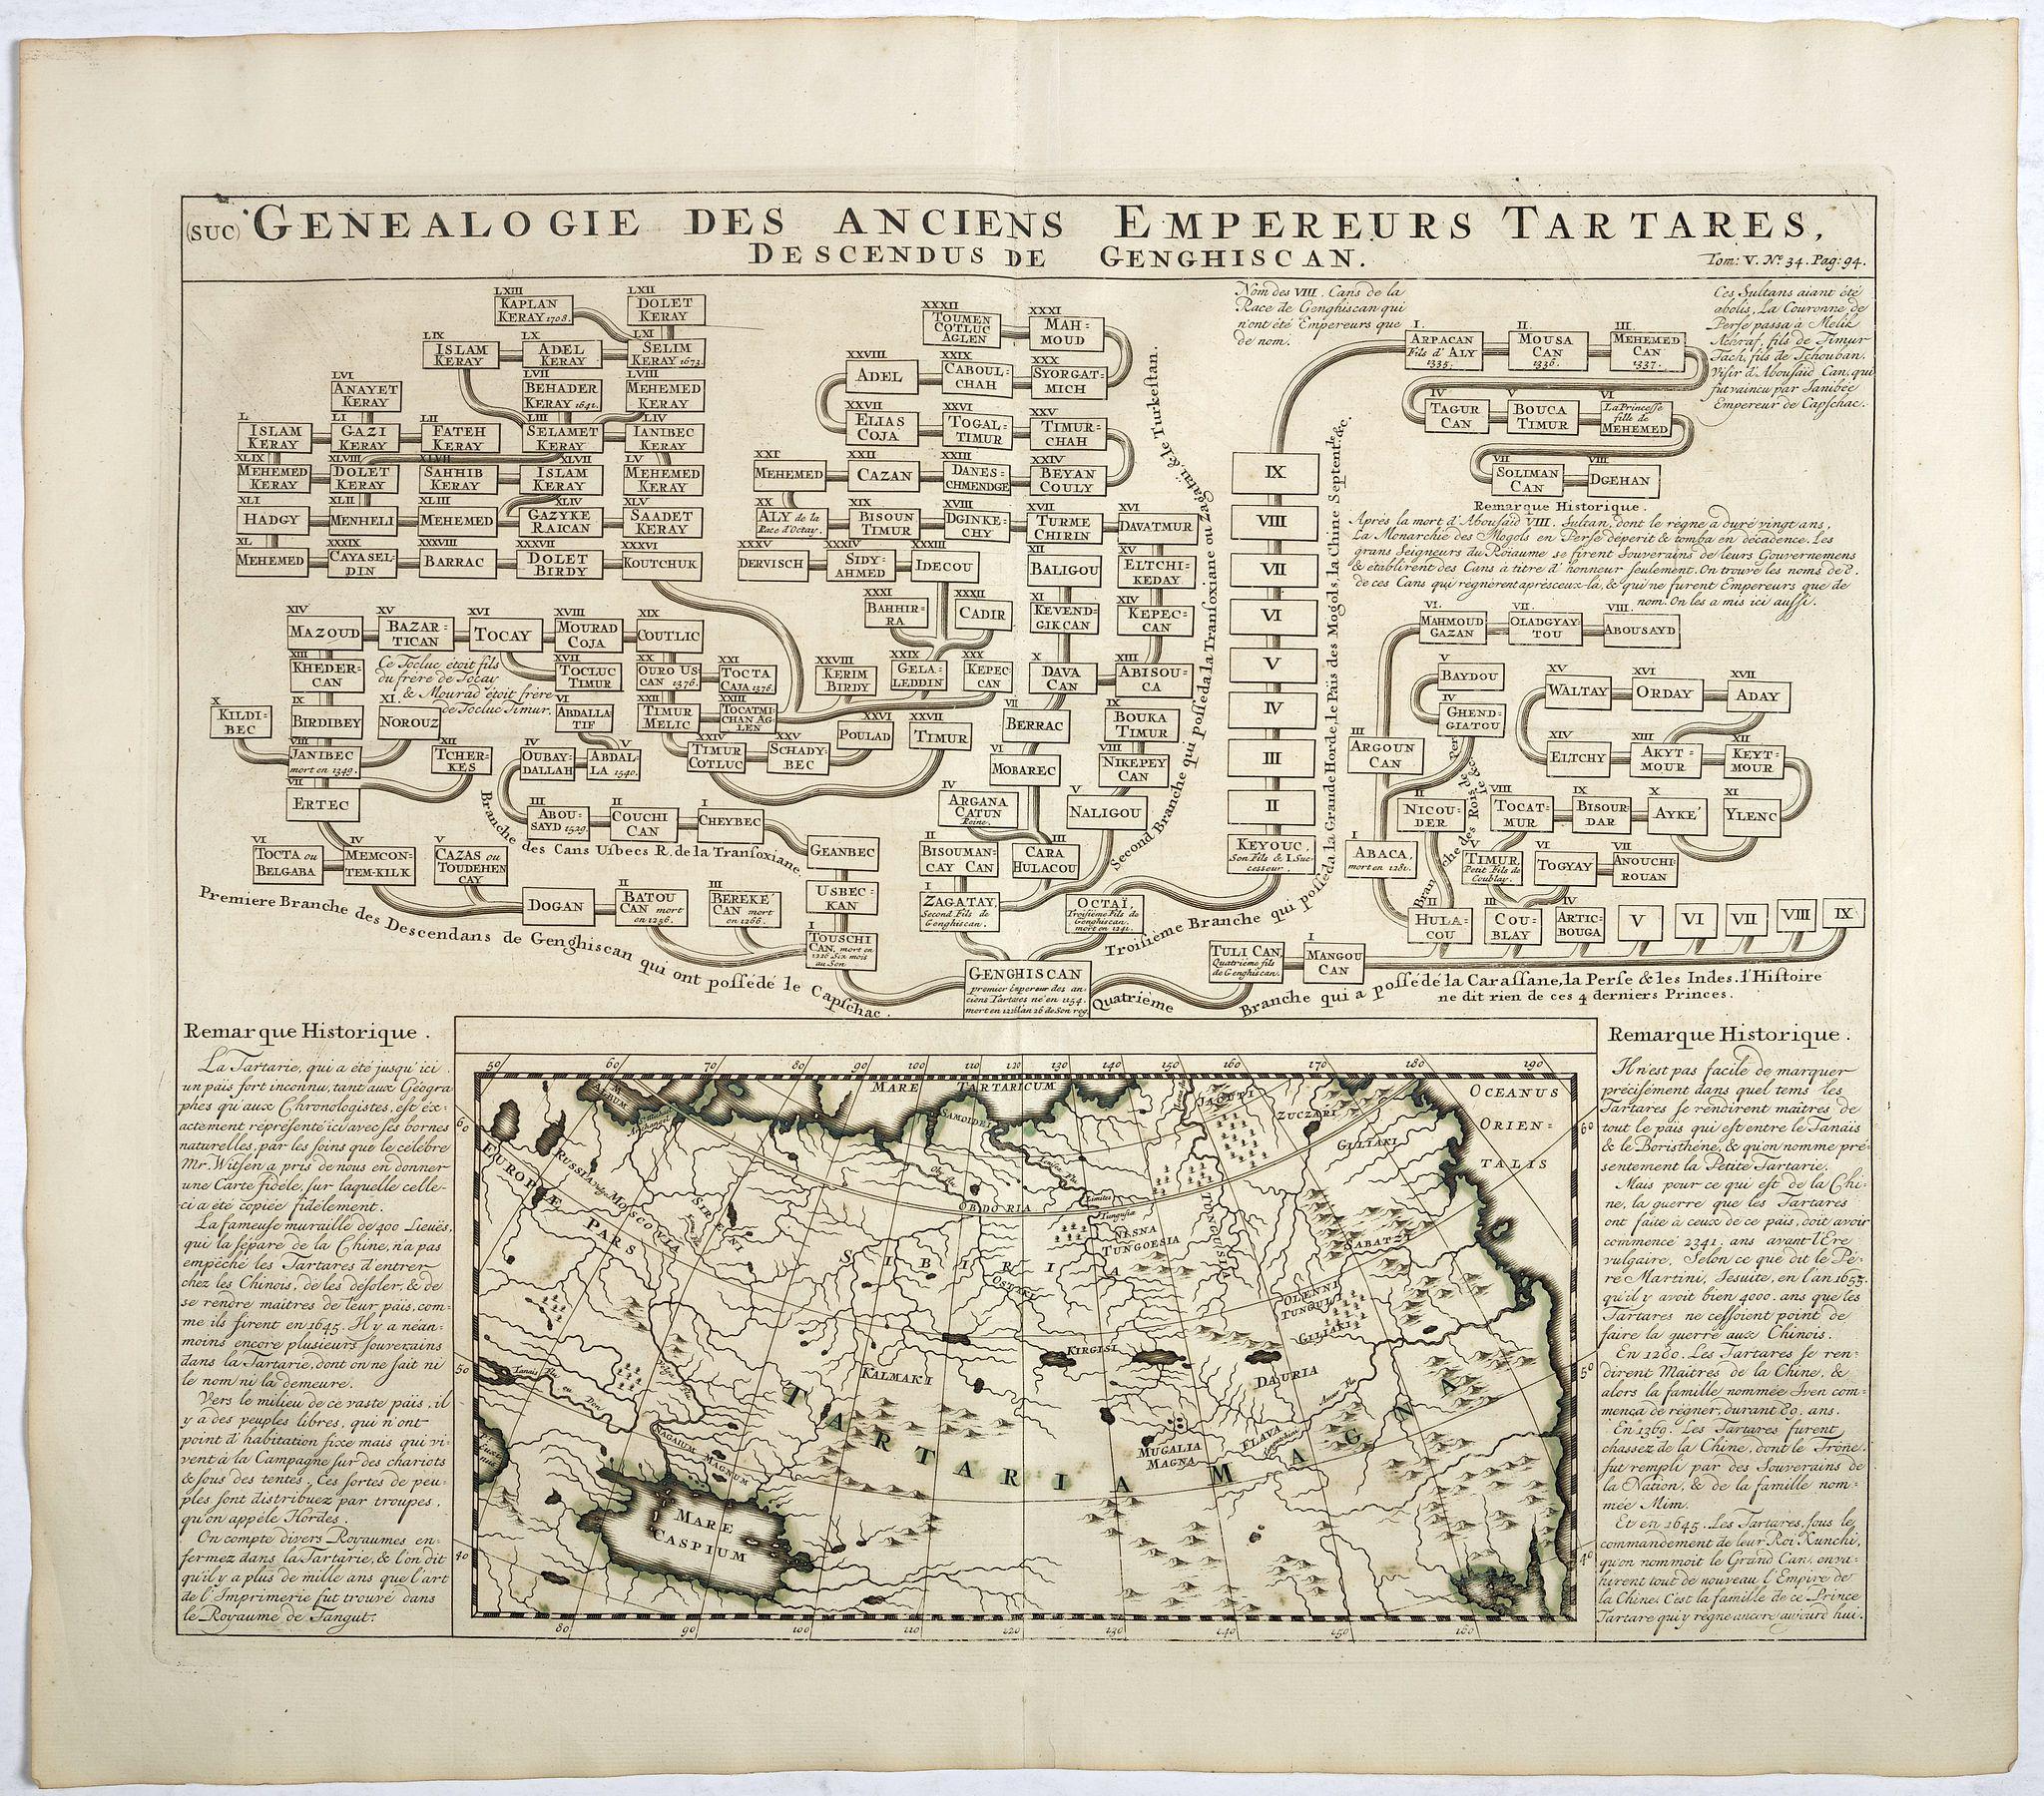 CHATELAIN, H. -  Genealogie des anciens empereurs Tartares,. . .